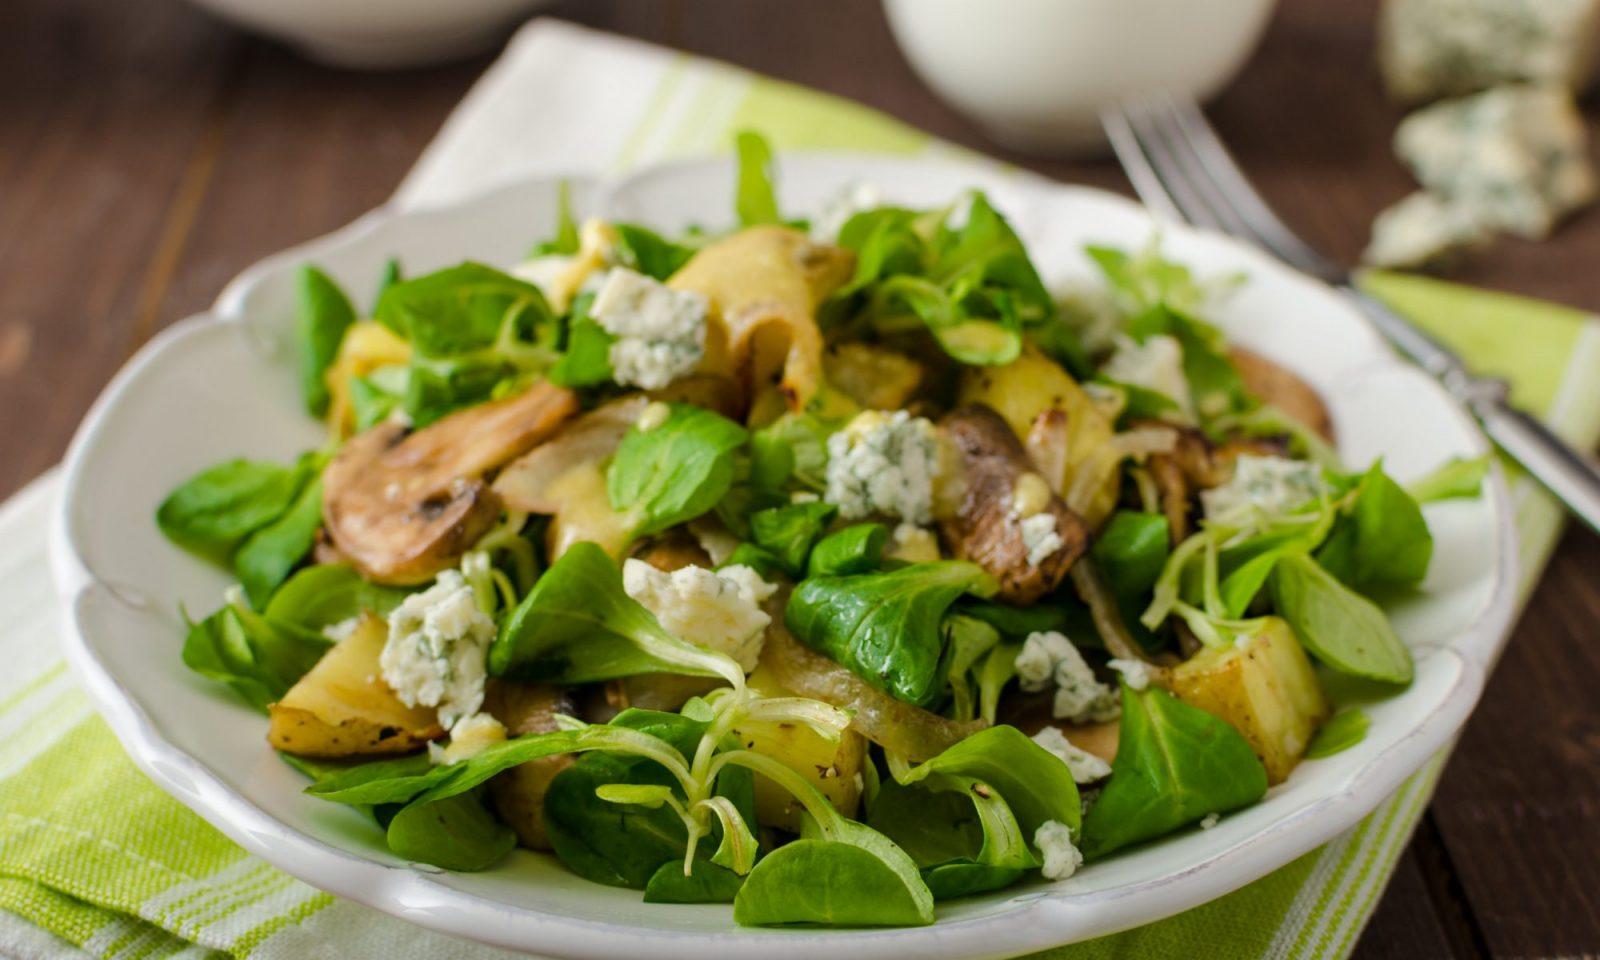 зеленый салат с молодым картофелем